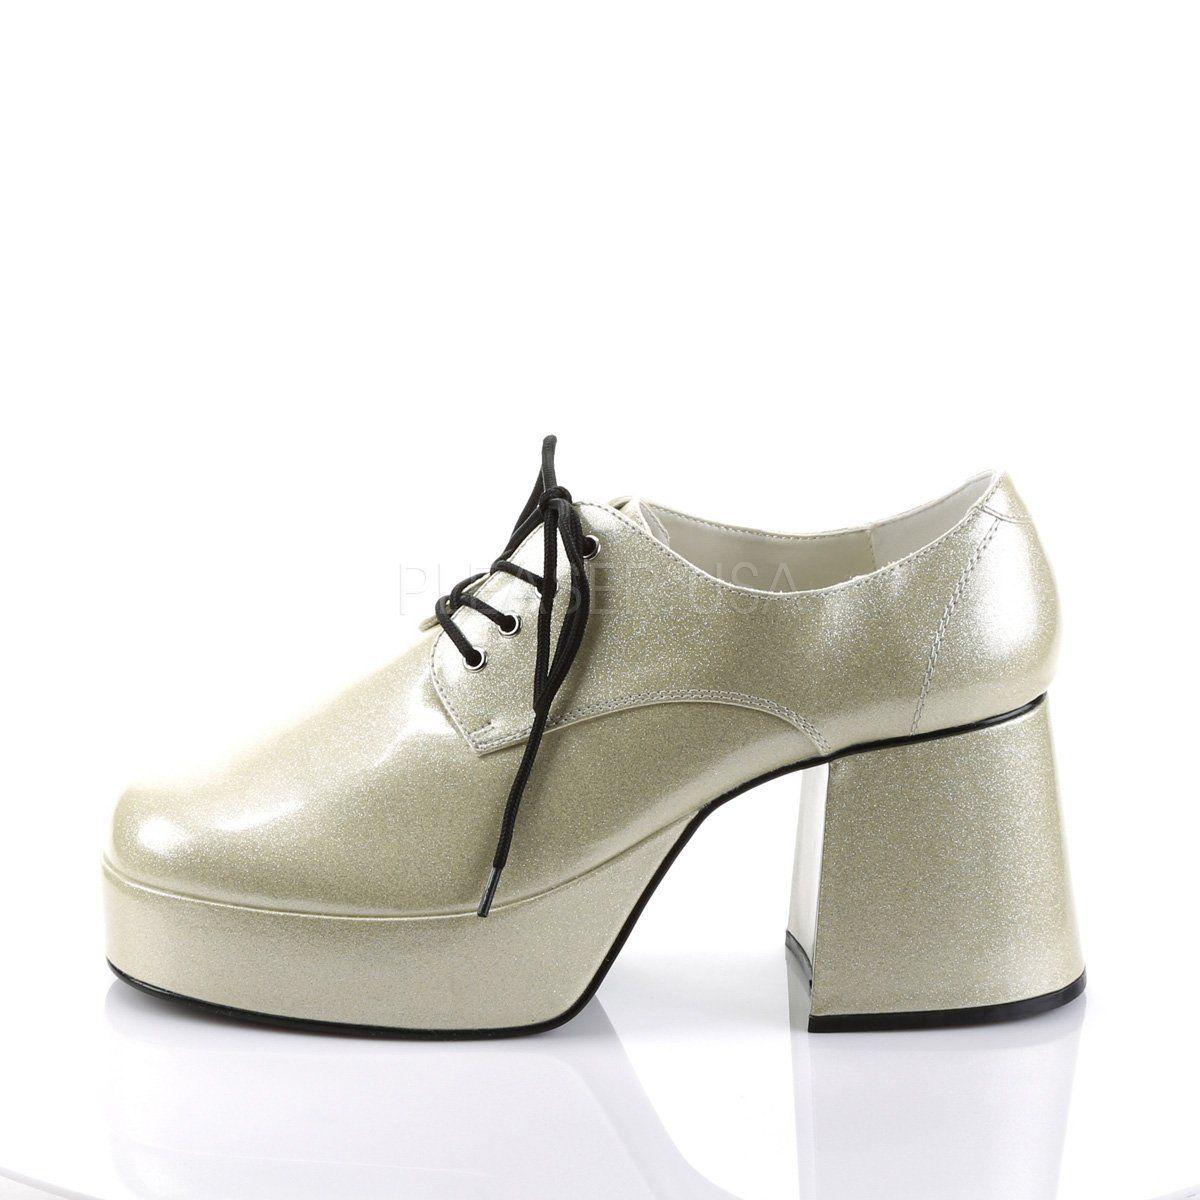 9337efed926 Funtasma - JAZZ-02G - Pearlized Silver Glitter - Men s Shoes ...